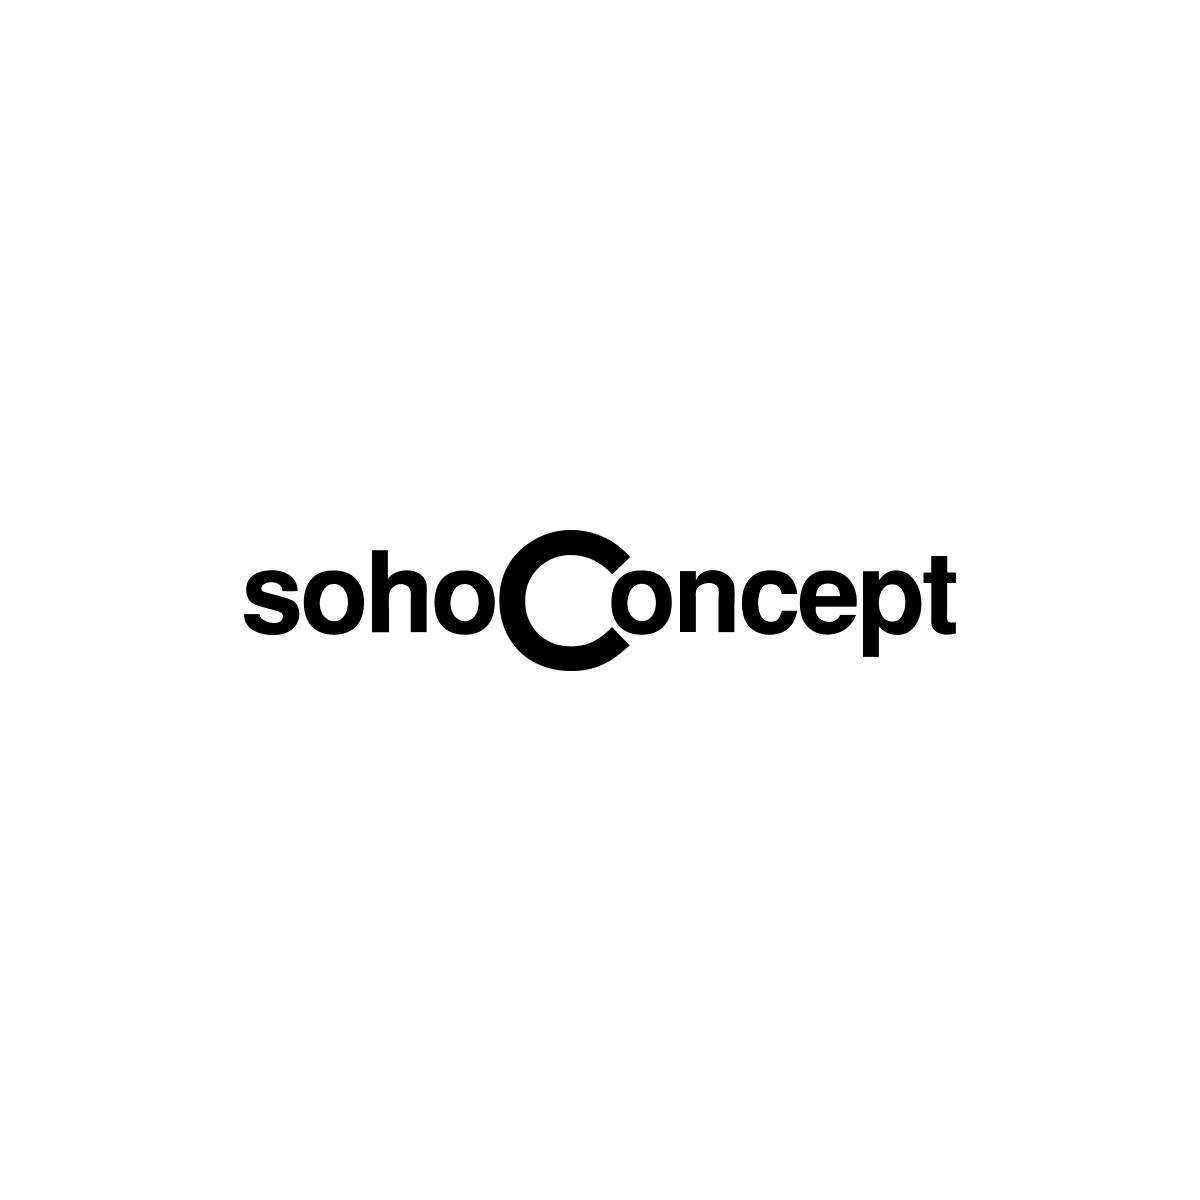 soho_concept